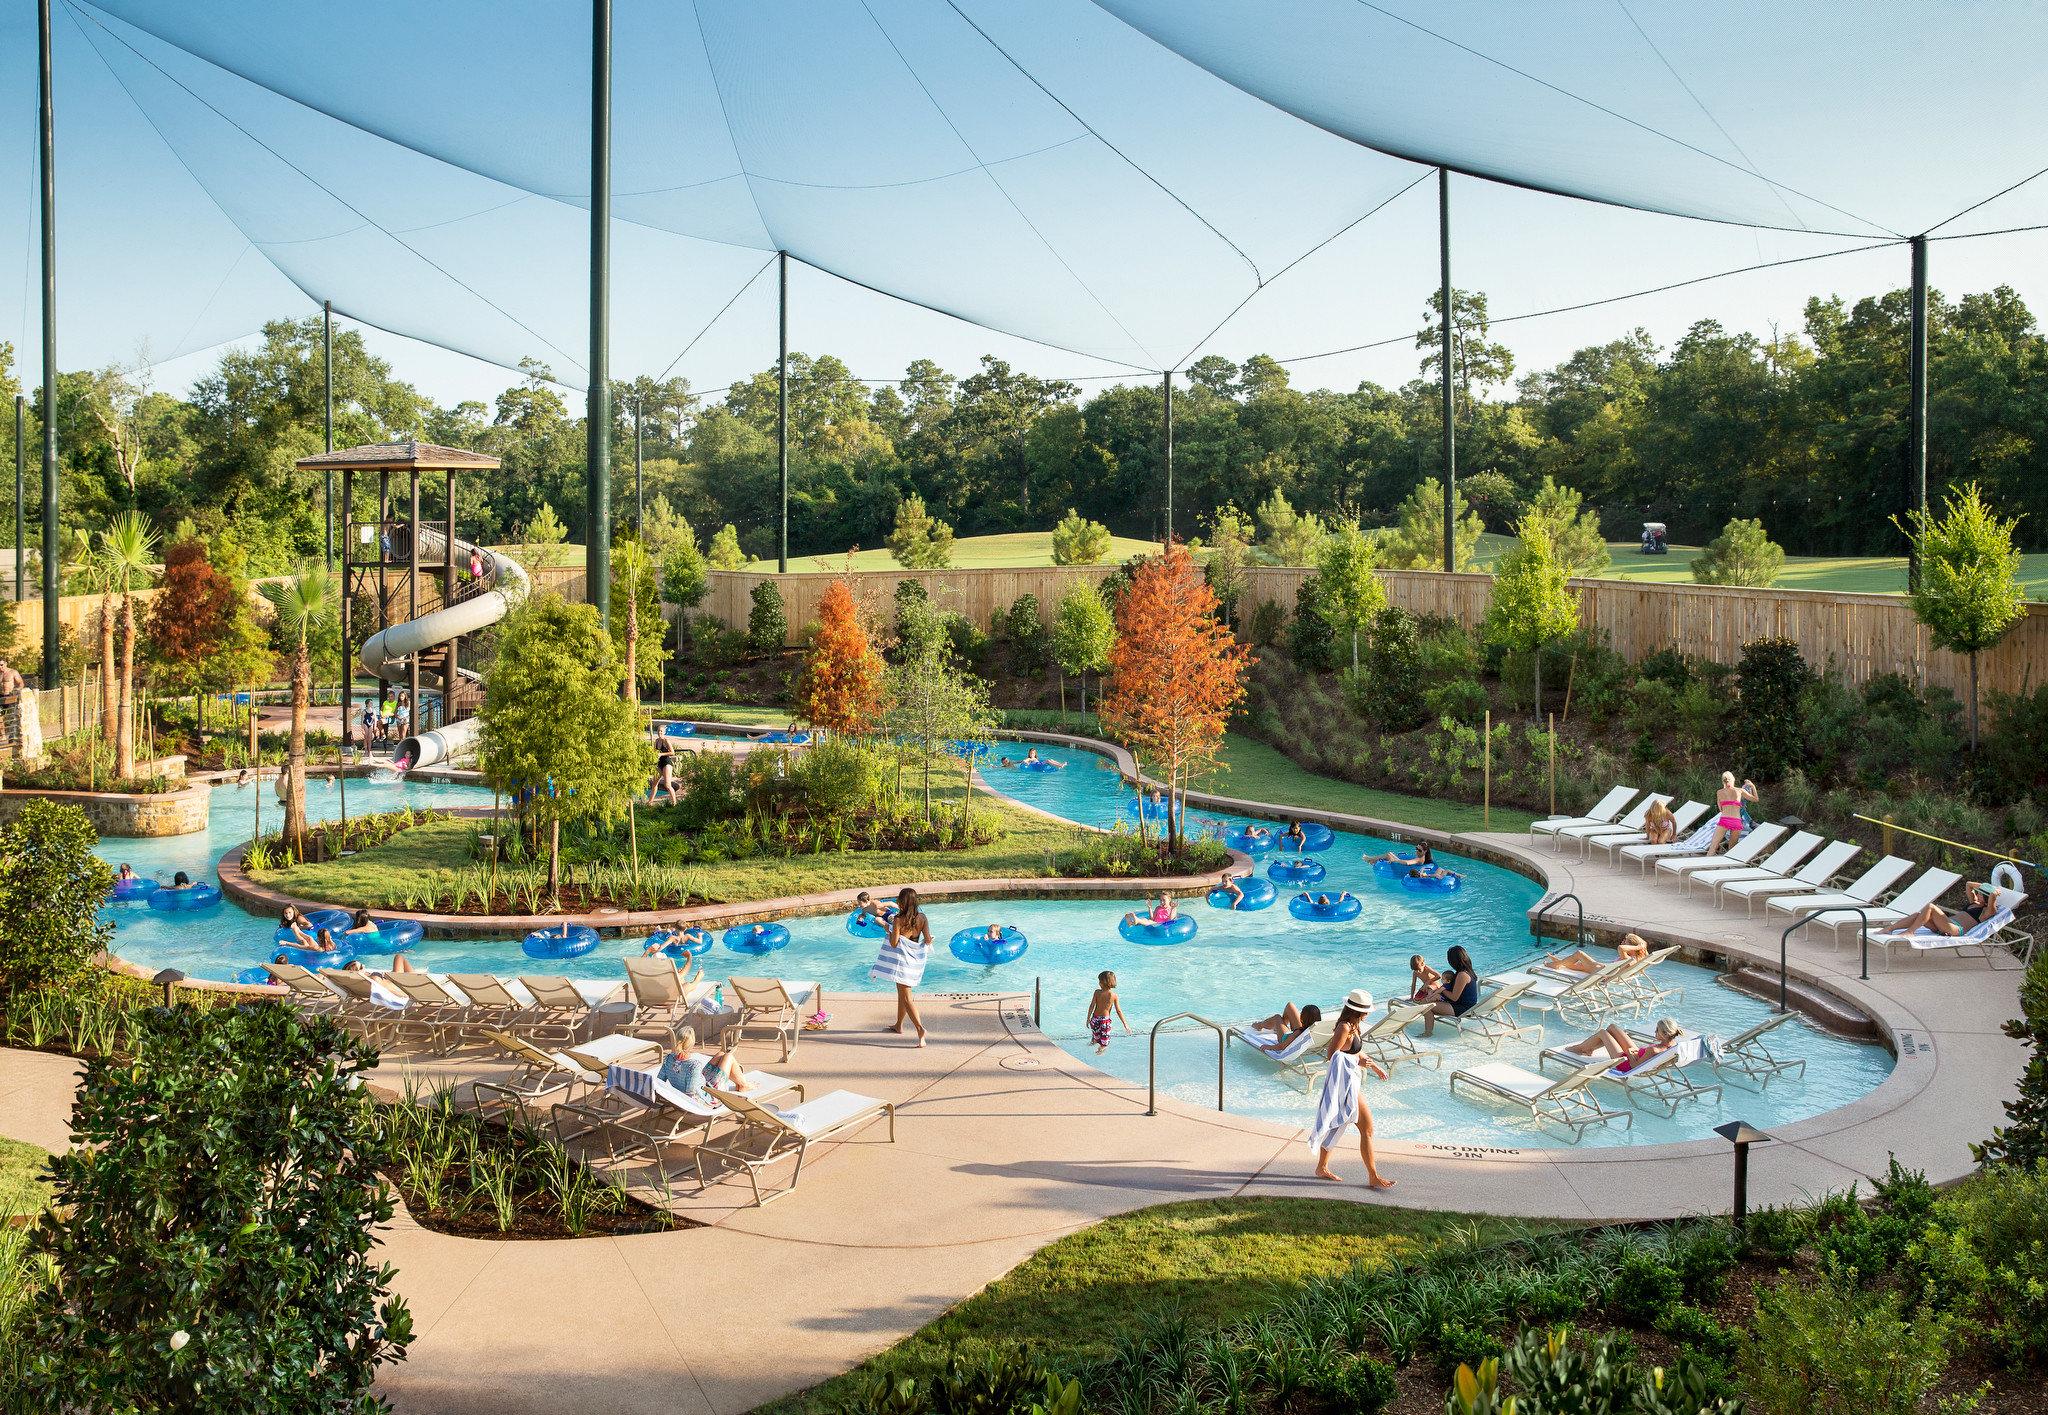 tree sky leisure swimming pool property Resort Water park amusement park park resort town backyard recreation